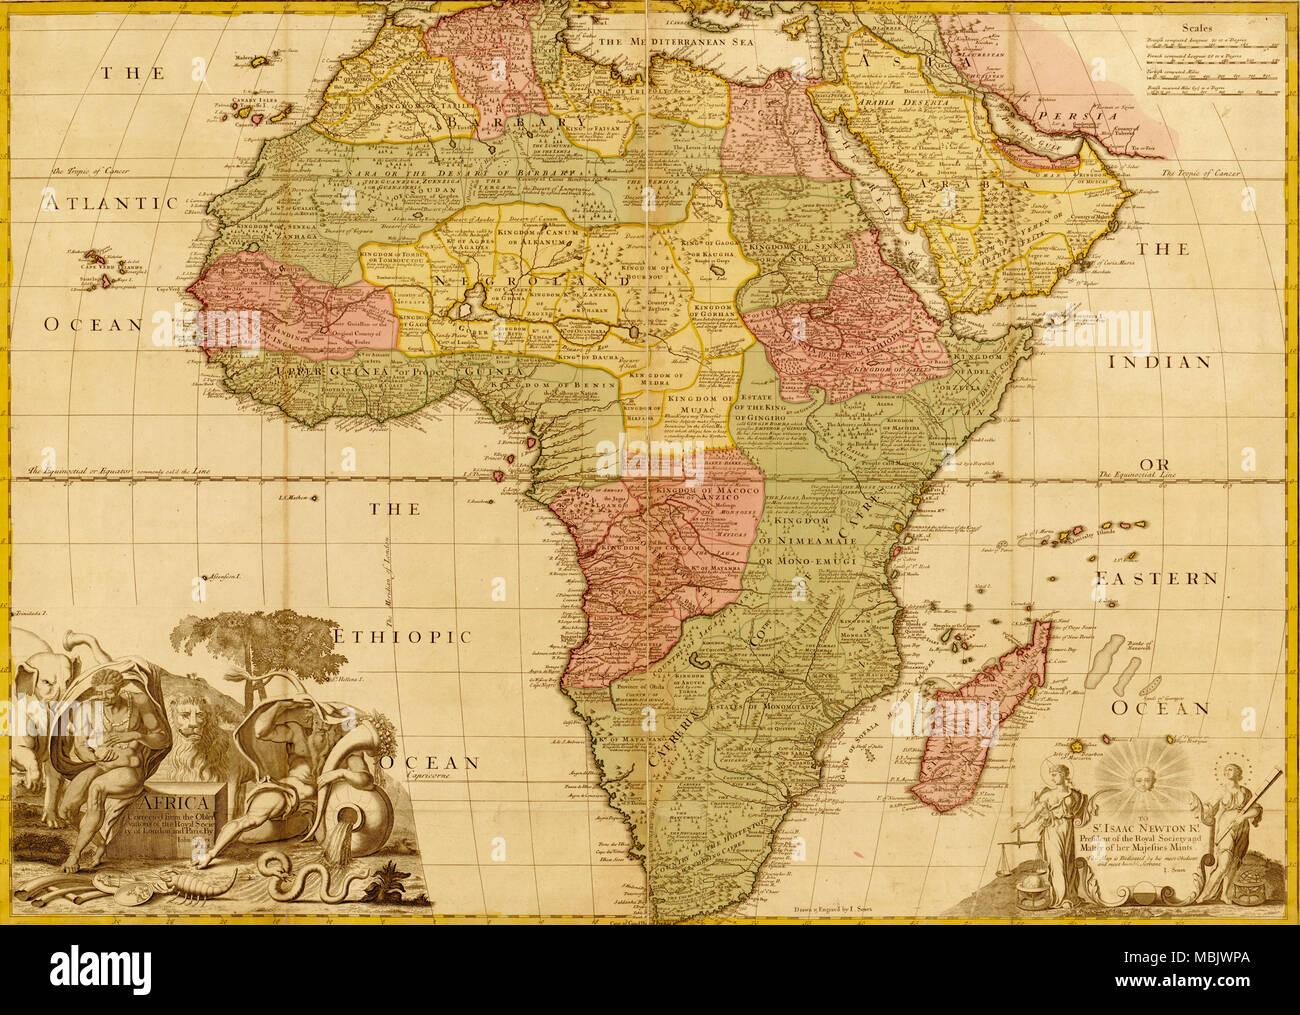 Africa - 1688 - Stock Image